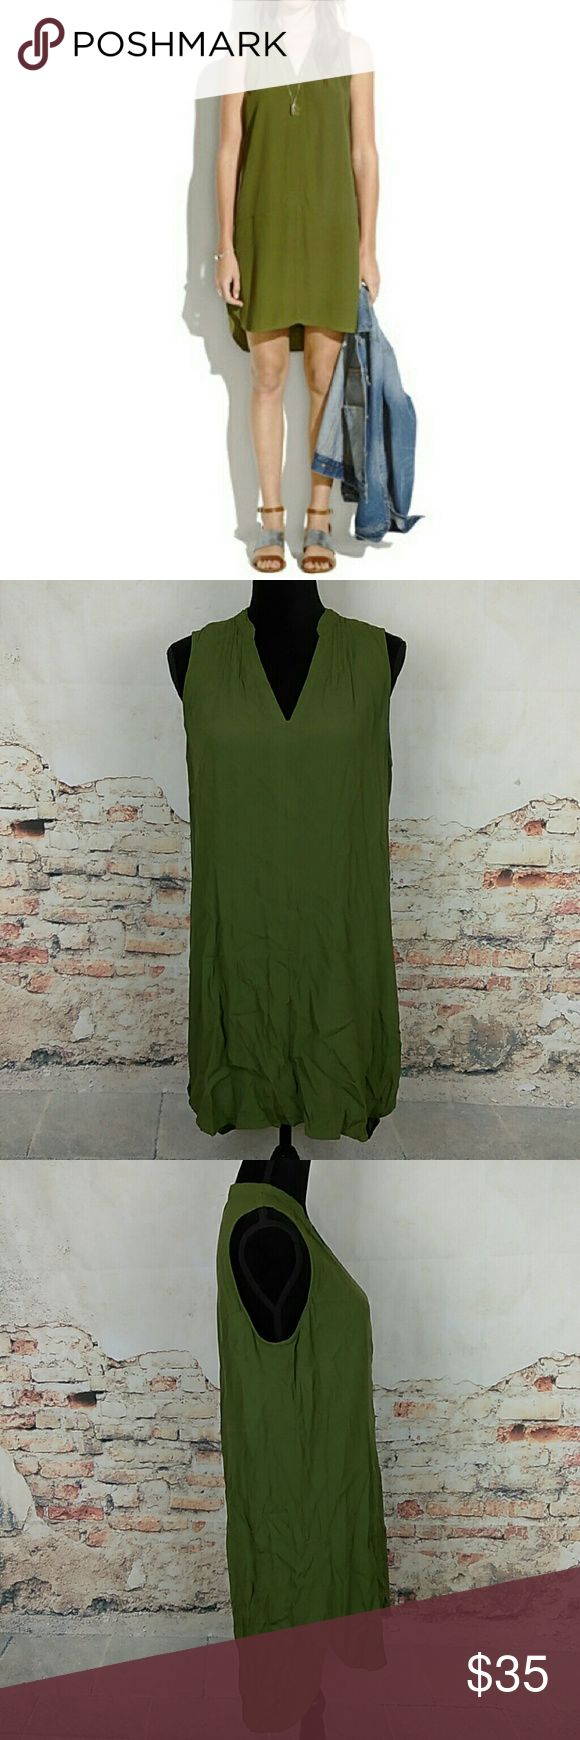 Madewell Fairsky Olive Green Tunic Dress Size Med Madewell Fairsky Olive Green Tunic Dress Size Med Madewell Dresses Mini